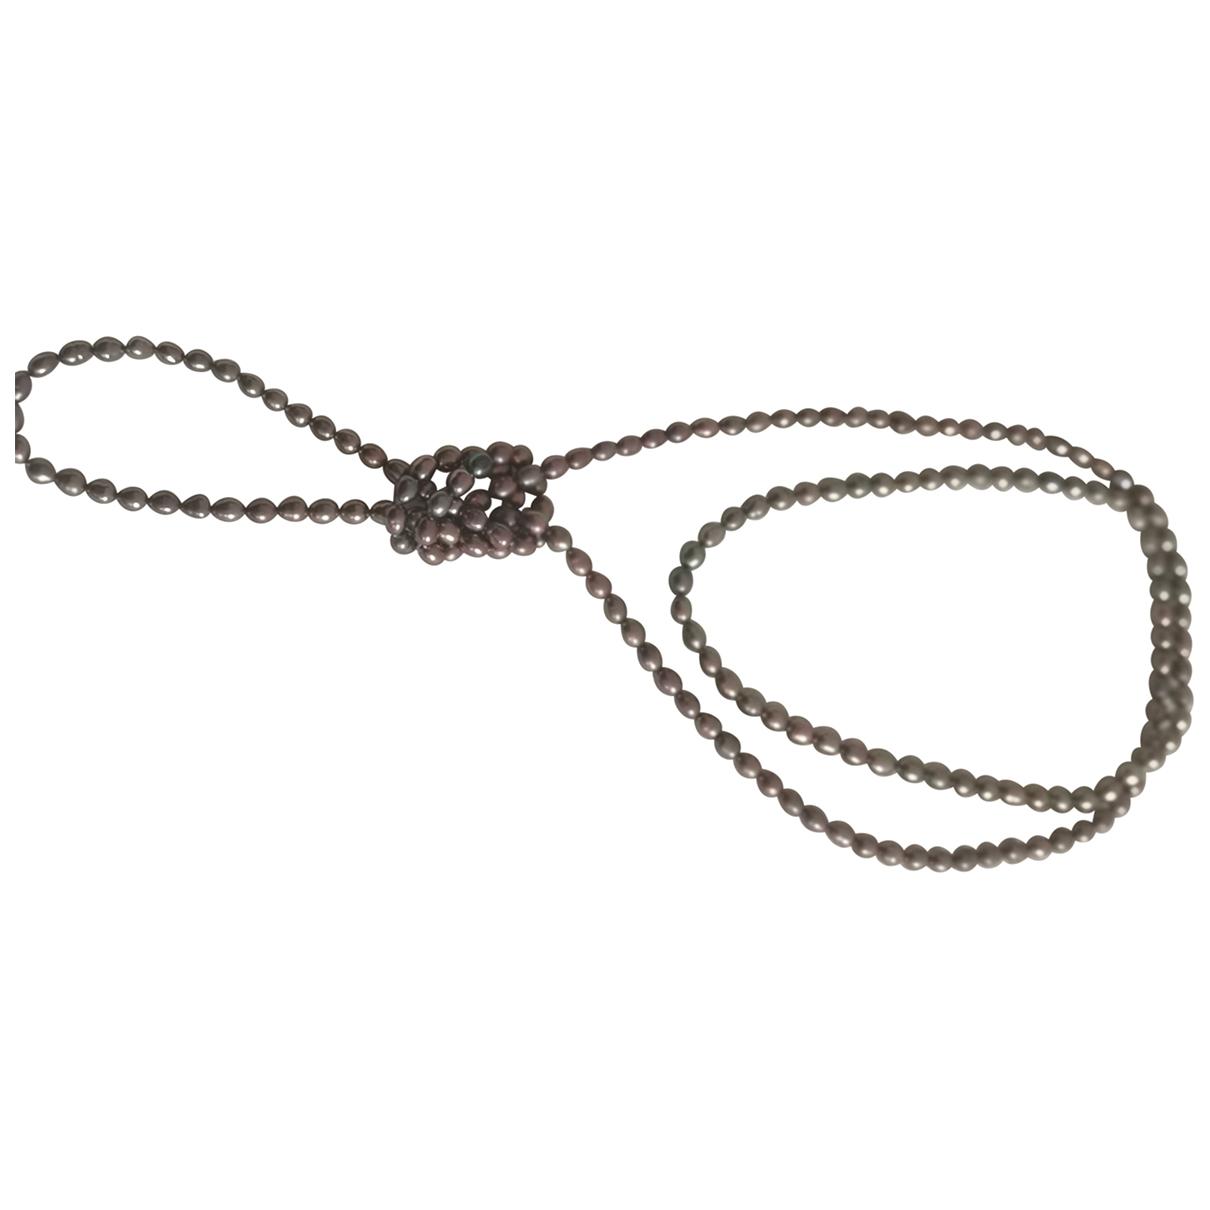 Non Signe / Unsigned Chaines Kette in Perlen